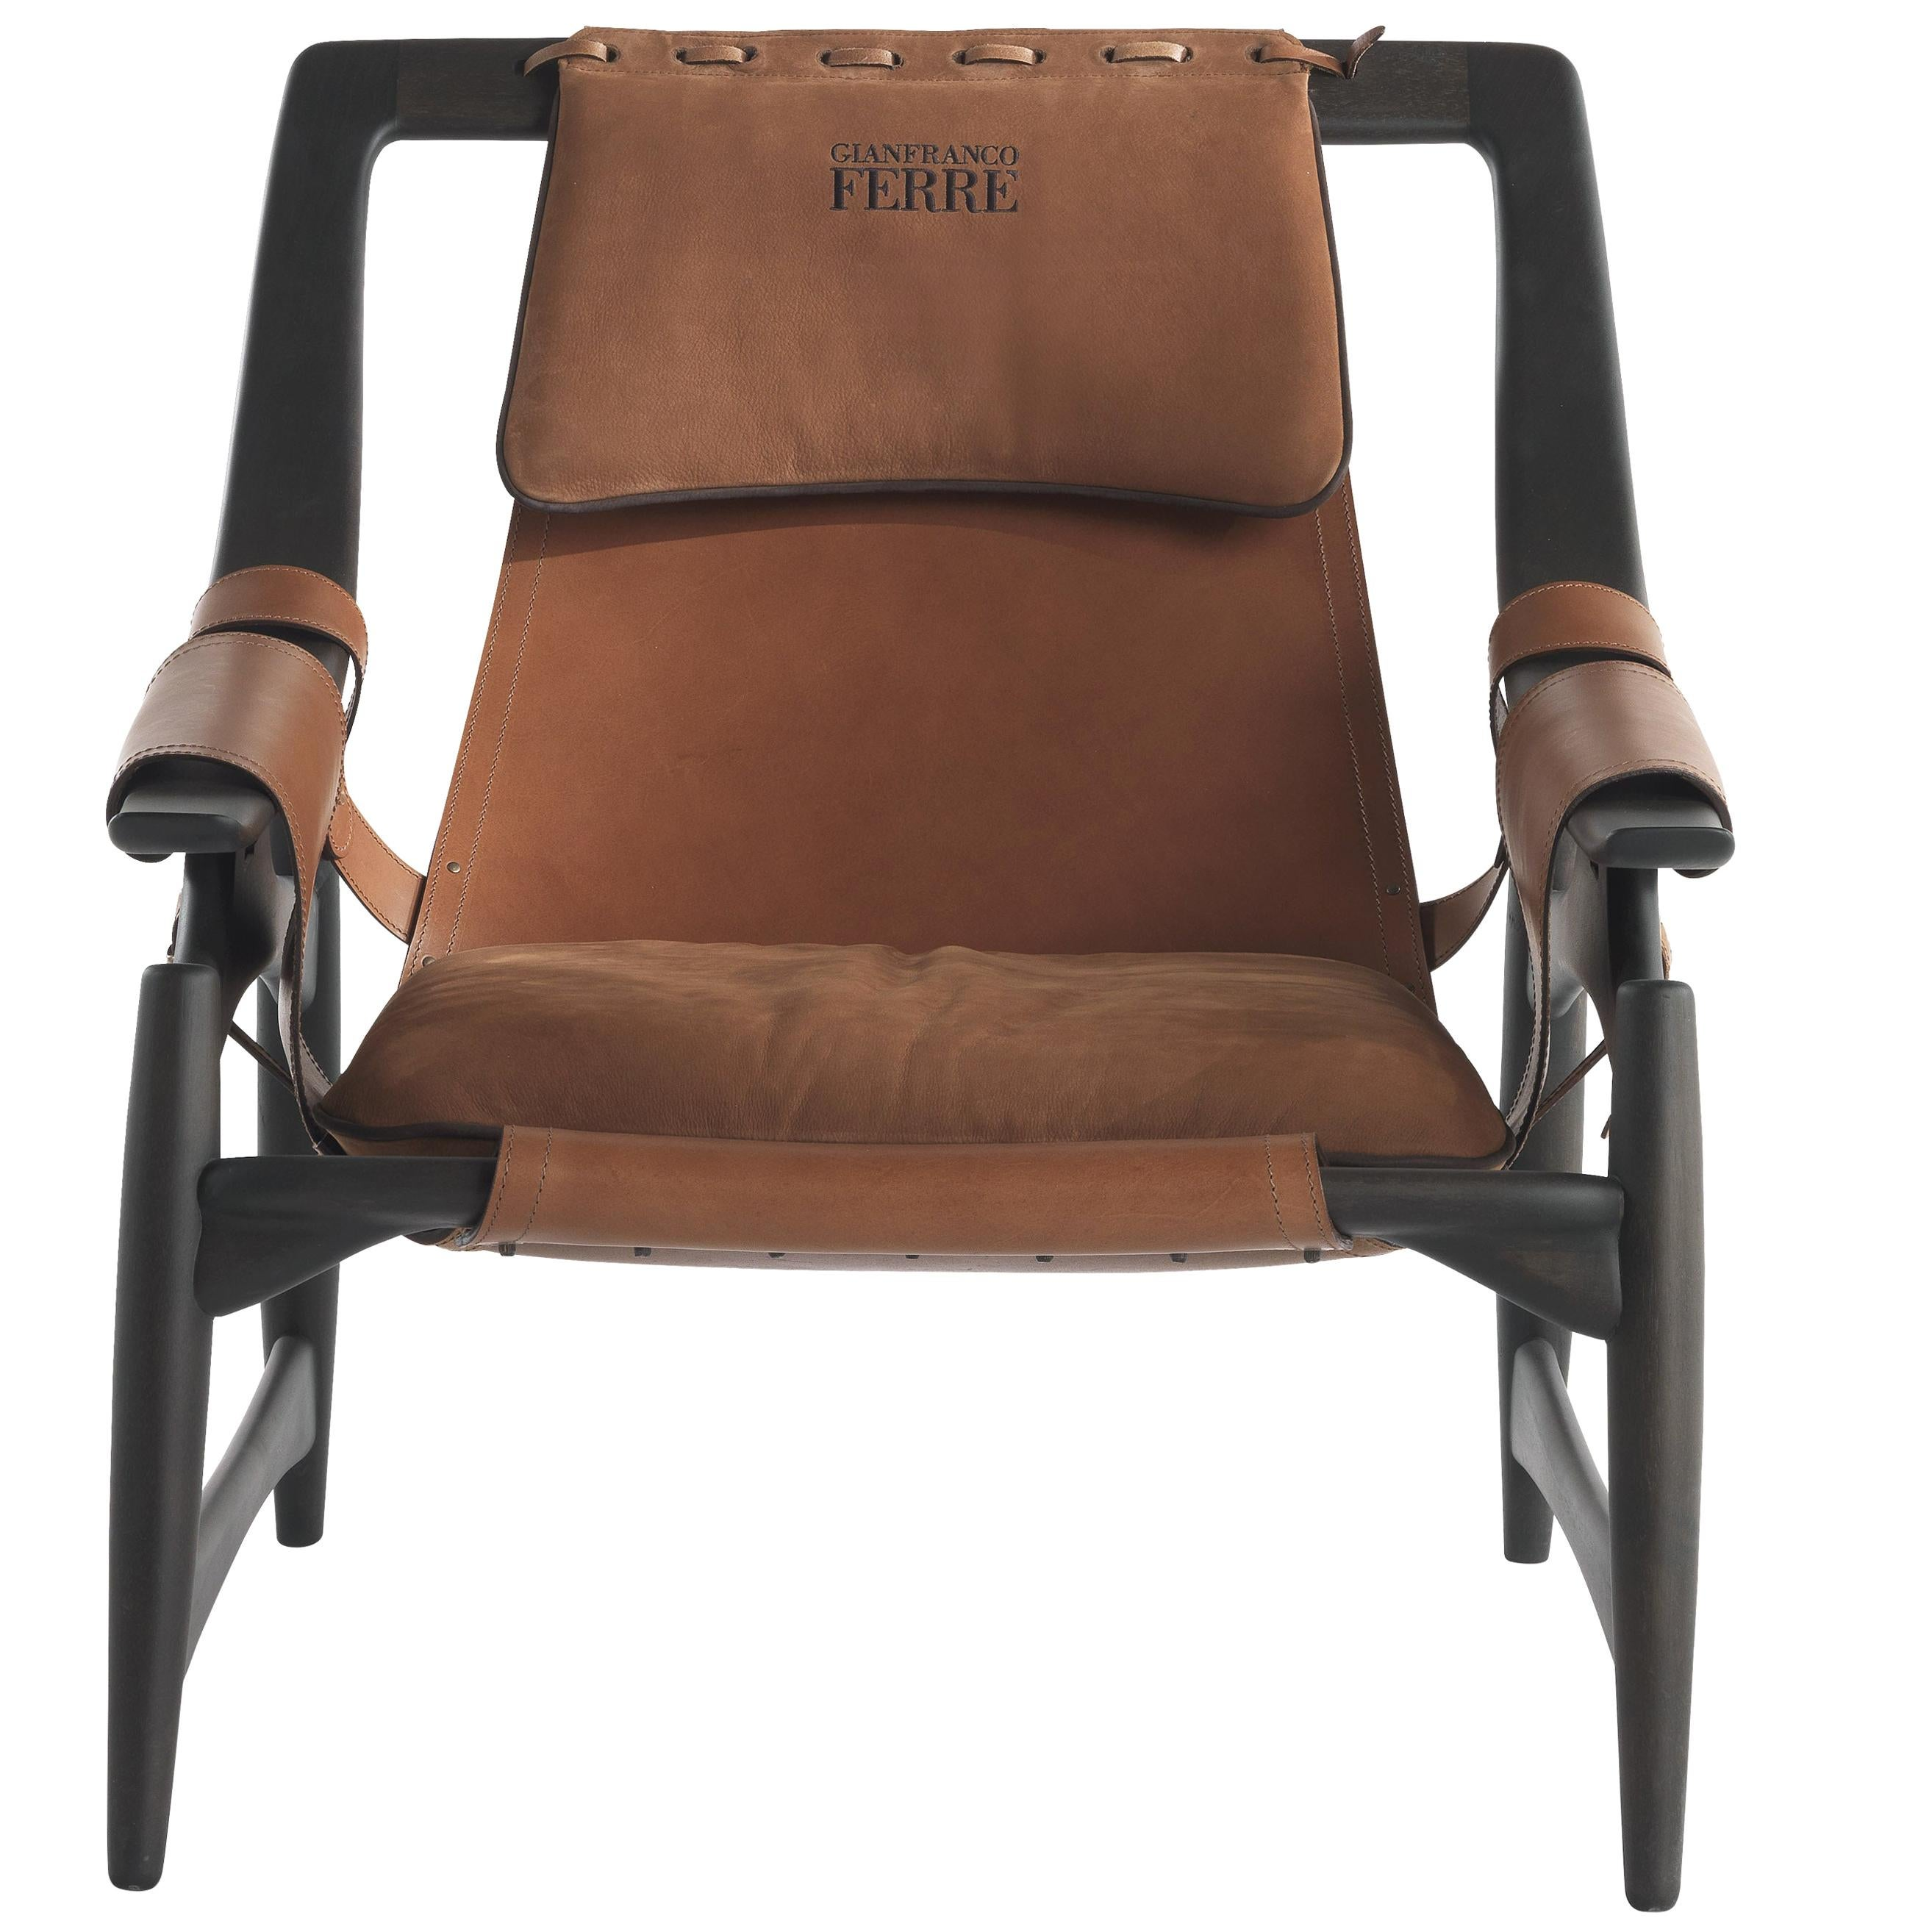 Gianfranco Ferré Home Kalamaja Armchair in Leather